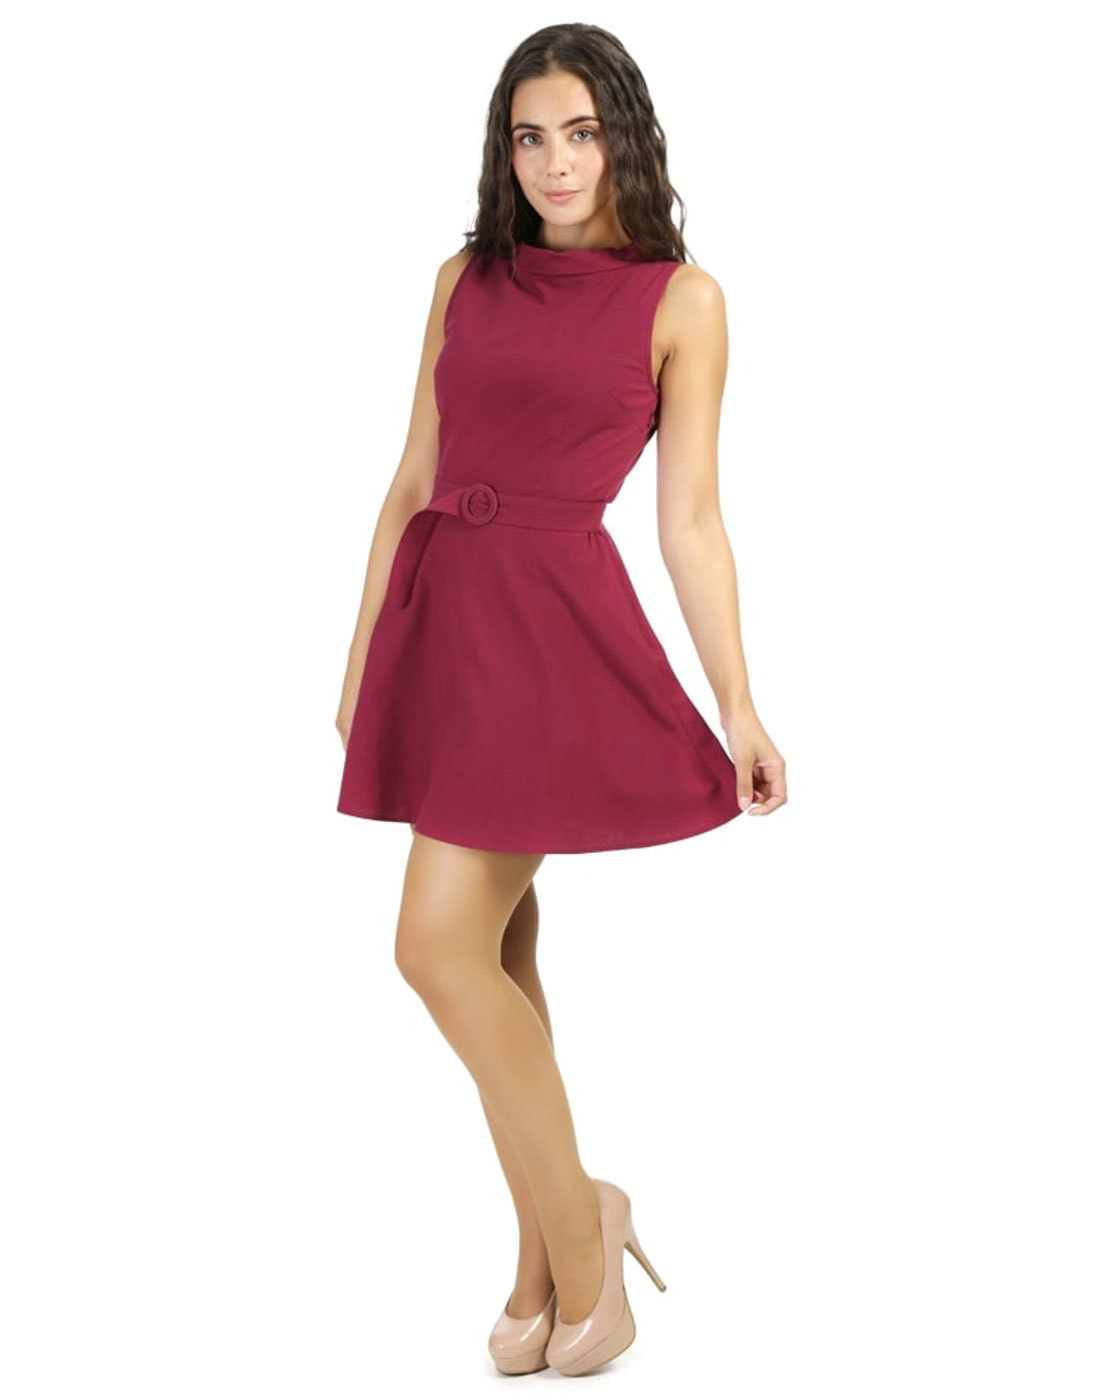 Beautiful And Bright Dining Room Ideas: BRIGHT & BEAUTIFUL Ruth Retro 60s Mod Dress In Plum